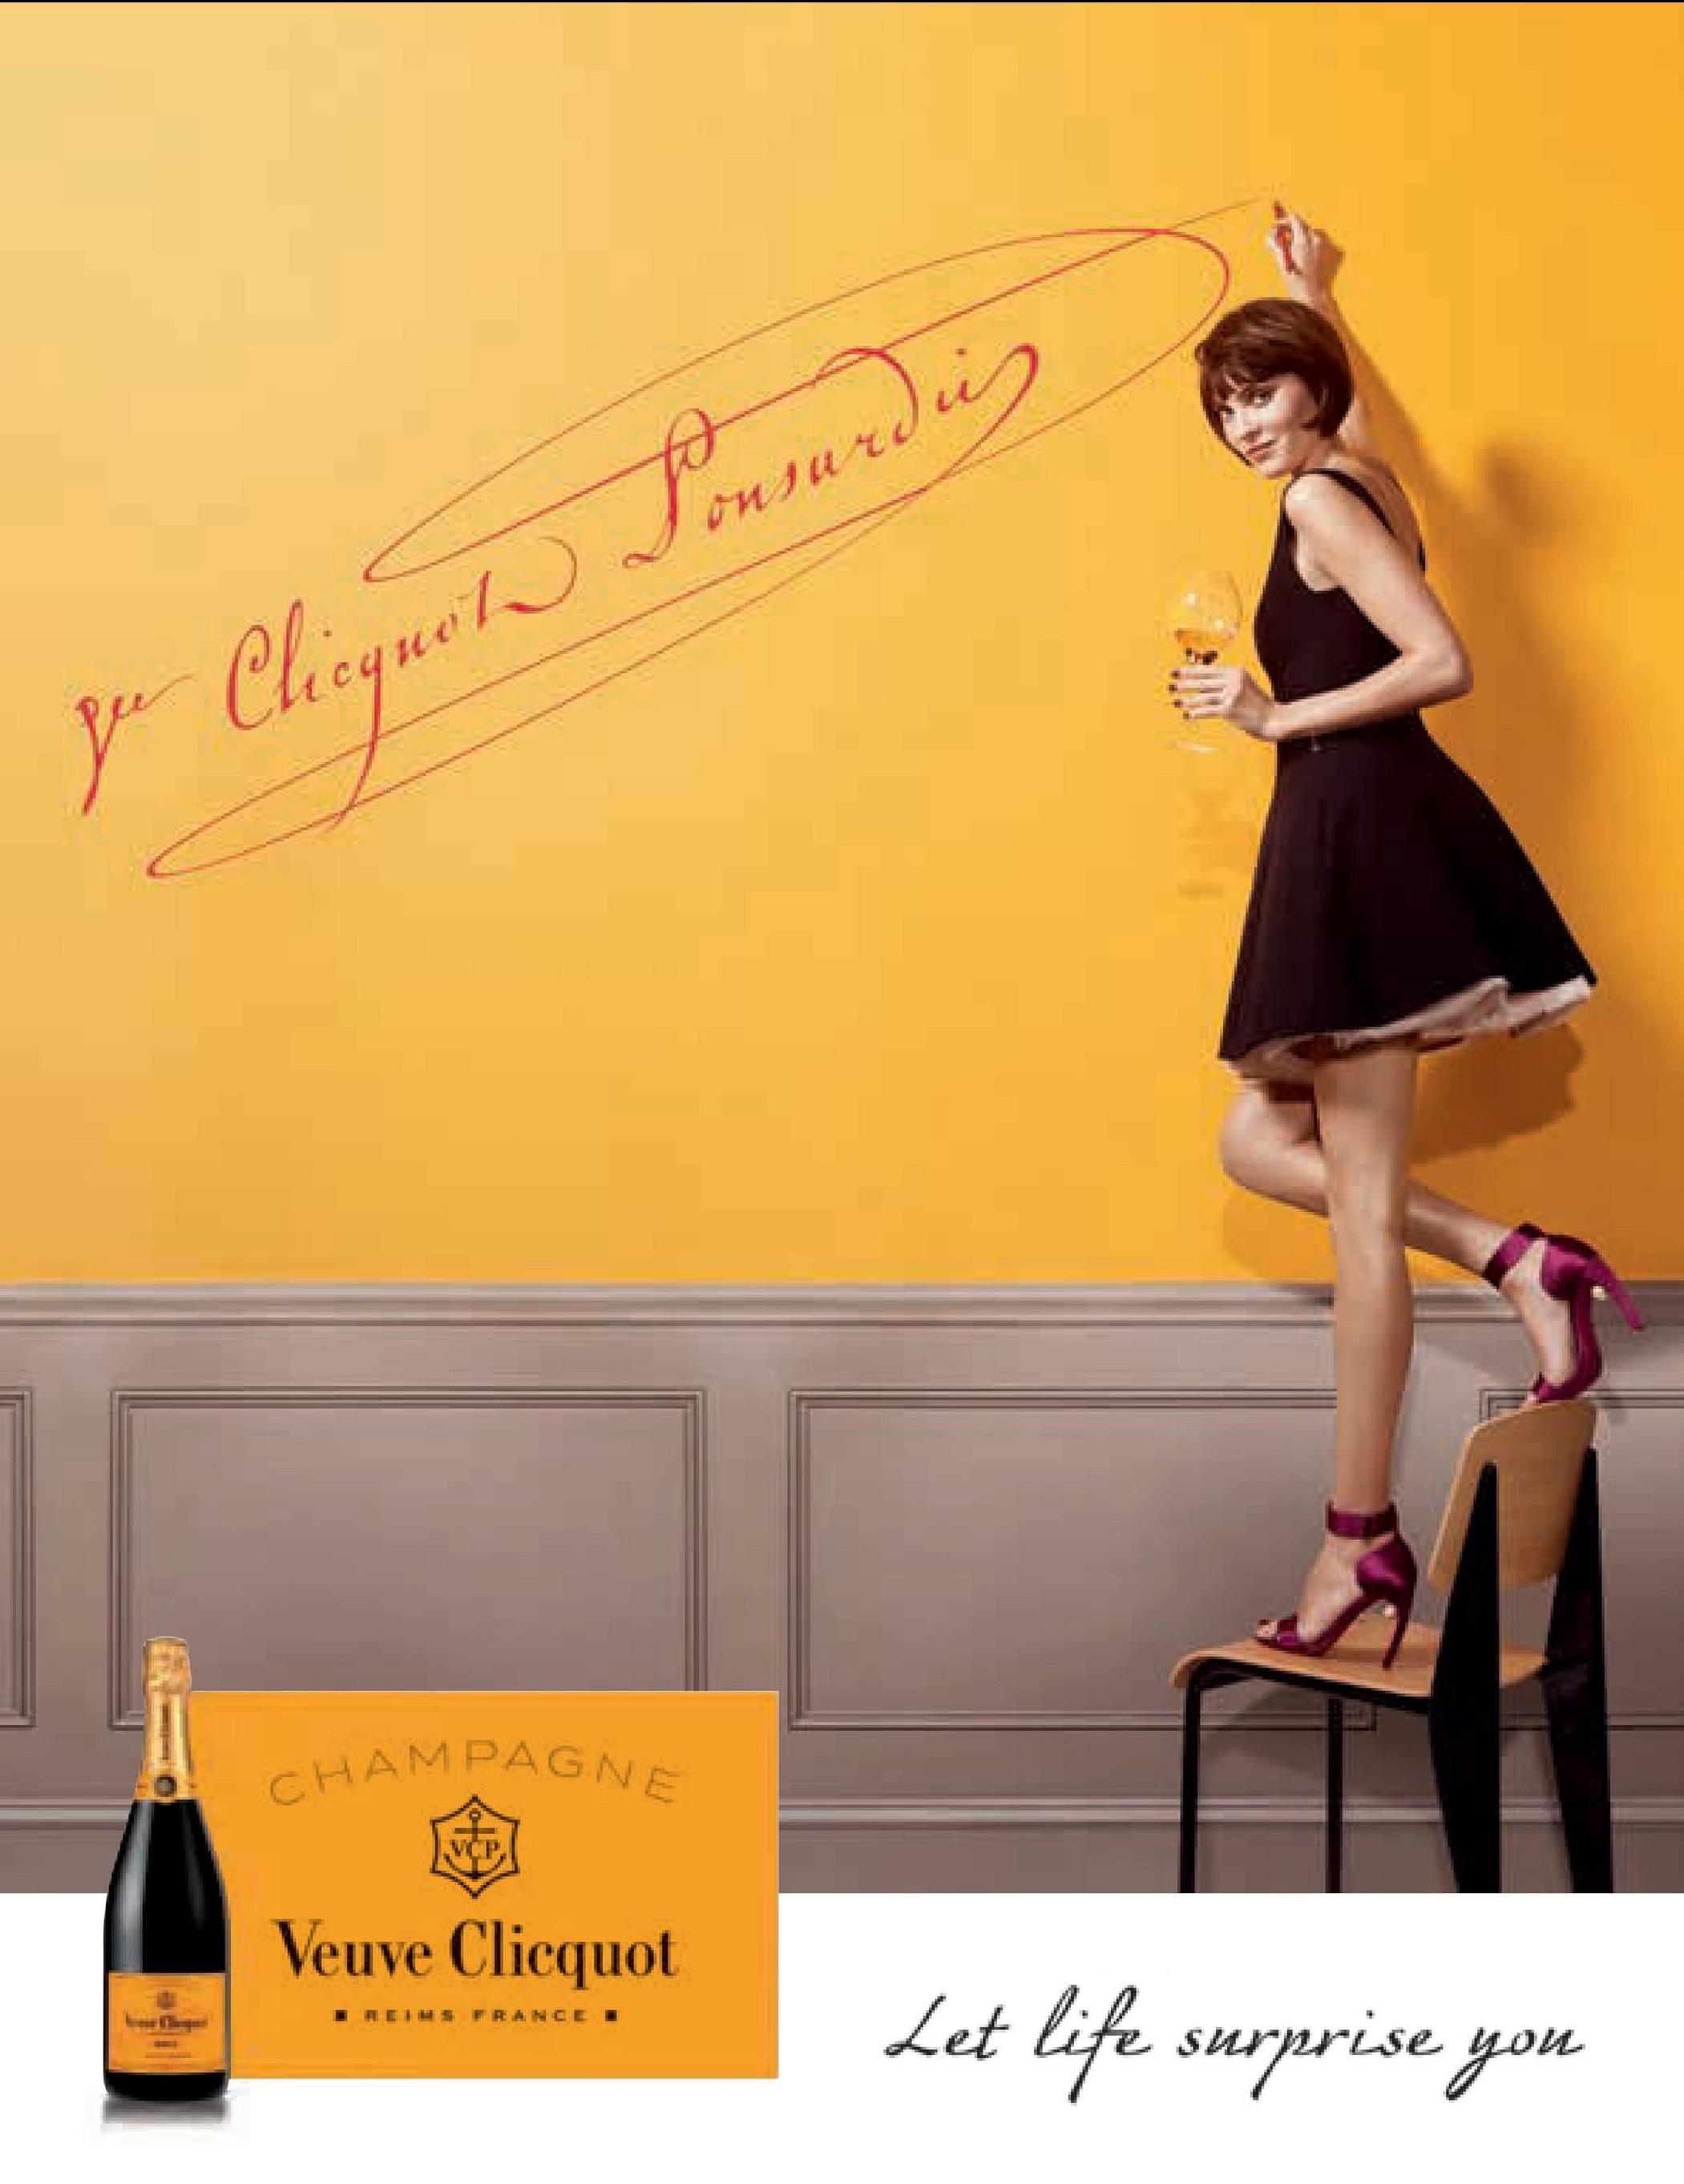 Forwarding po Chequest CHAMPAGNE Veuve Clicquot Let life surprise you